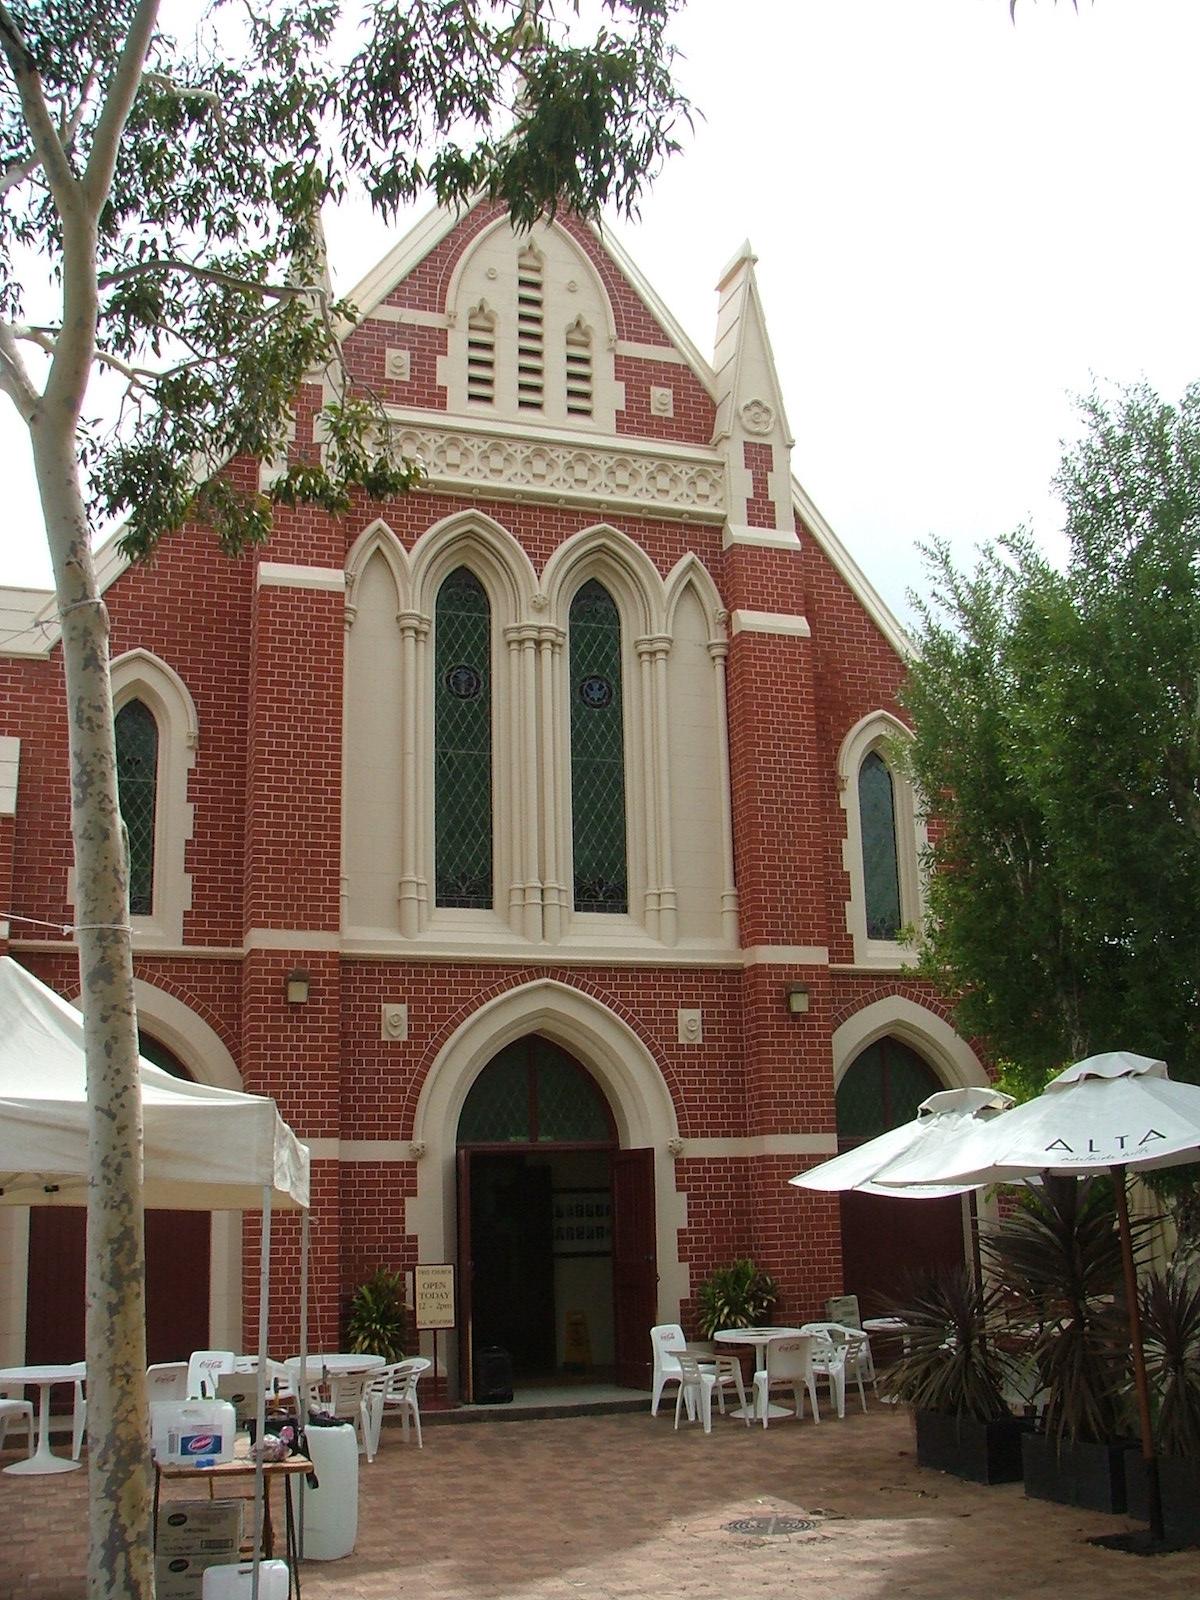 ross church photo 2 feb 09.JPG